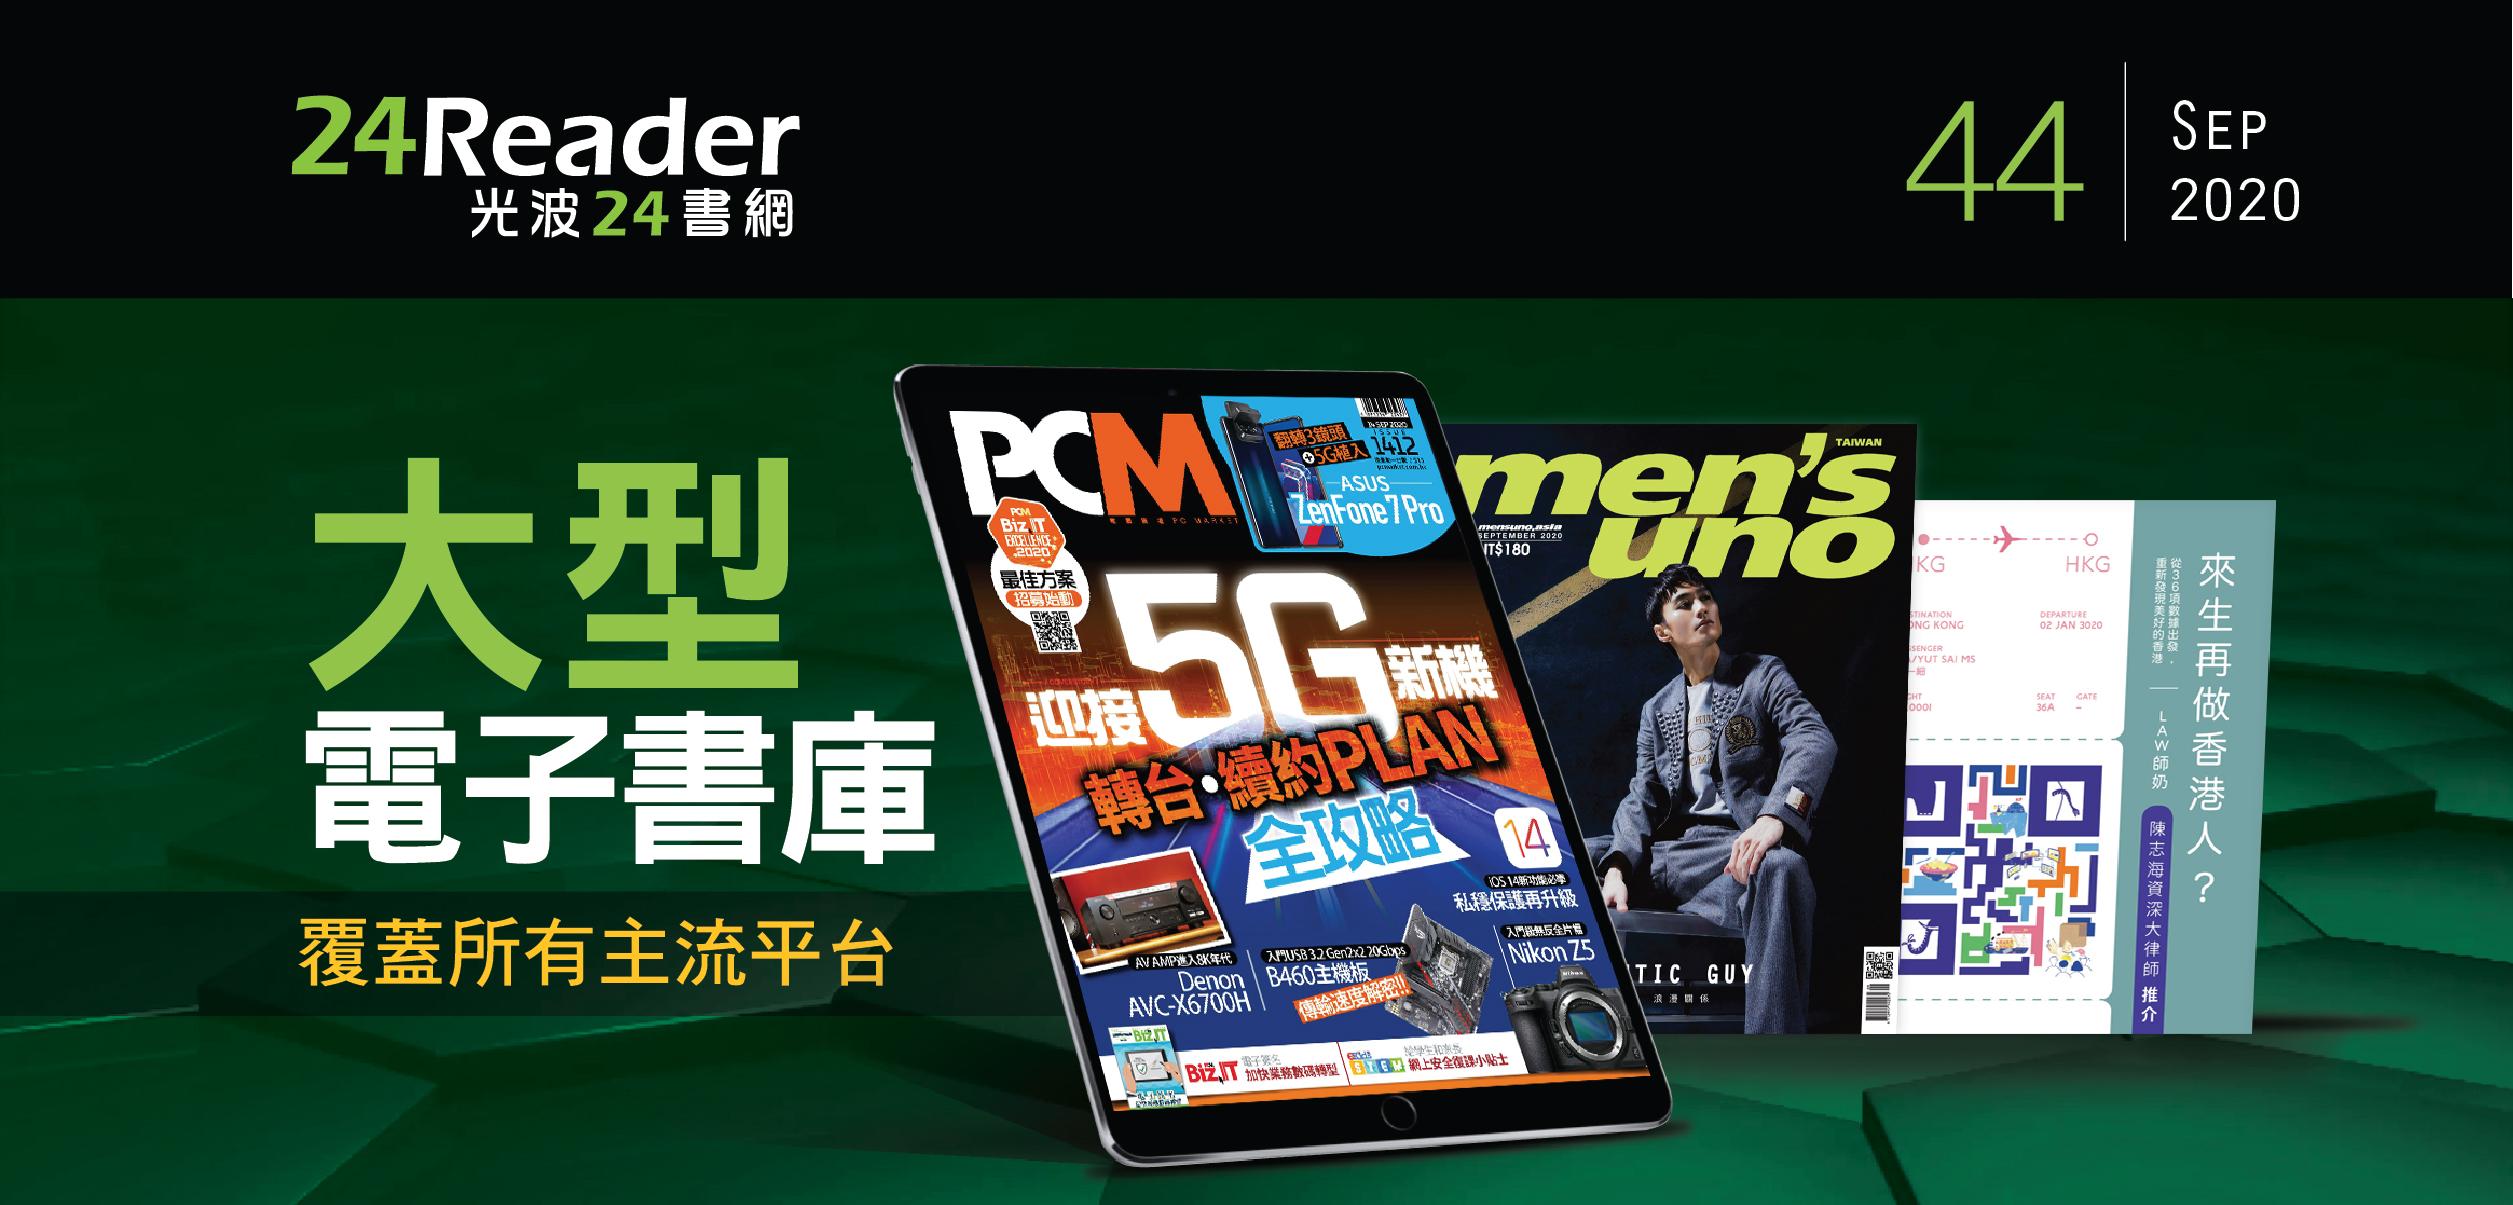 《PC Market 電腦廣場》迎接 5G 新機  轉台.續約 PLAN 全攻略